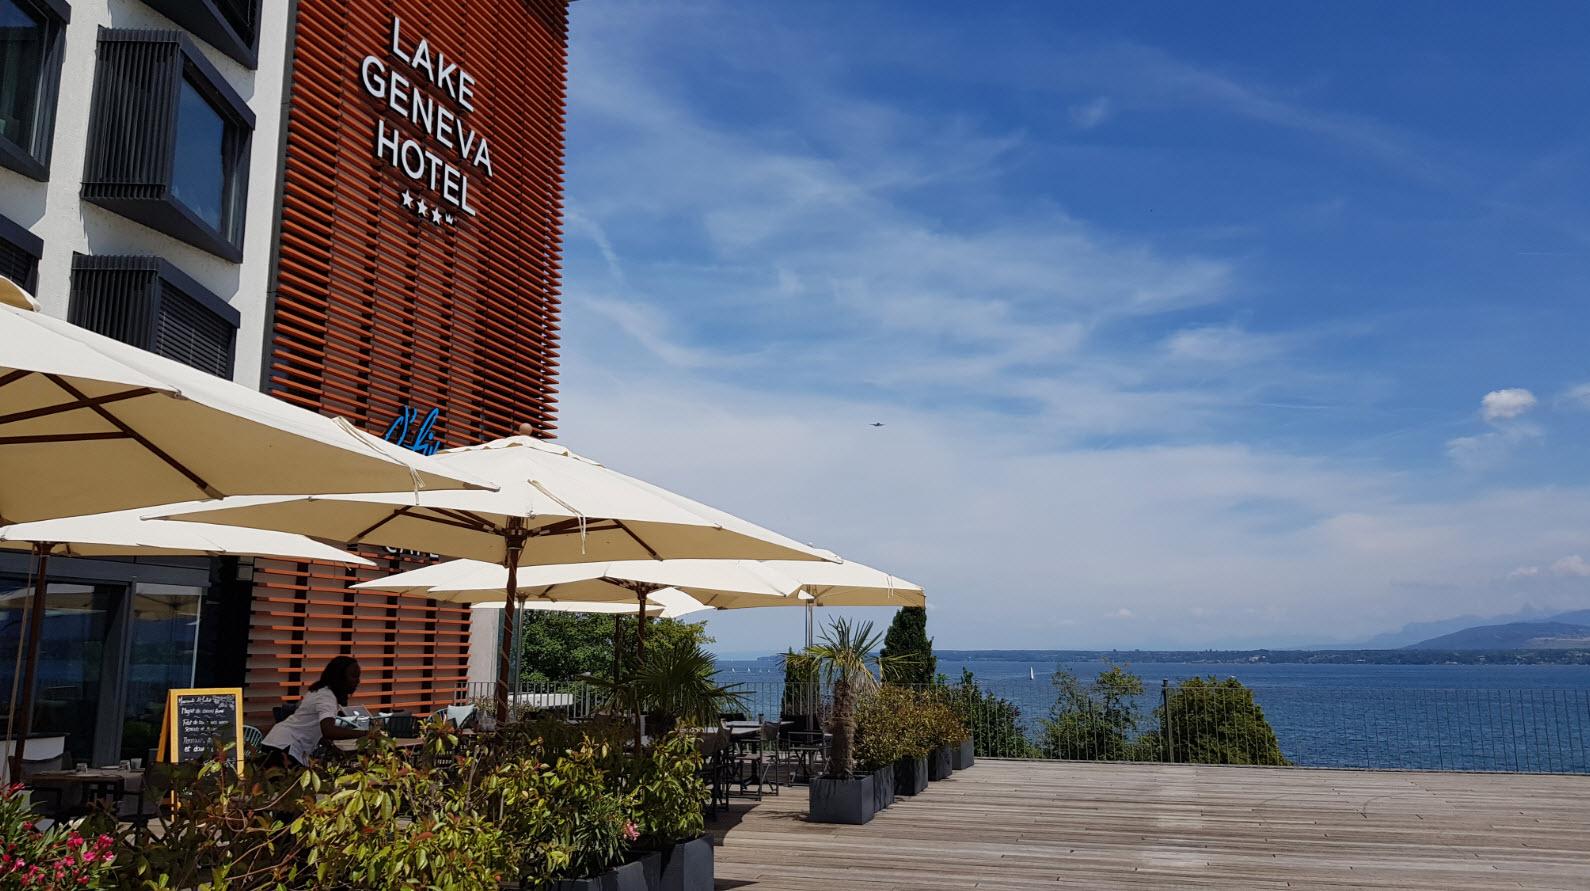 Restaurant Lake Geneva Versoix